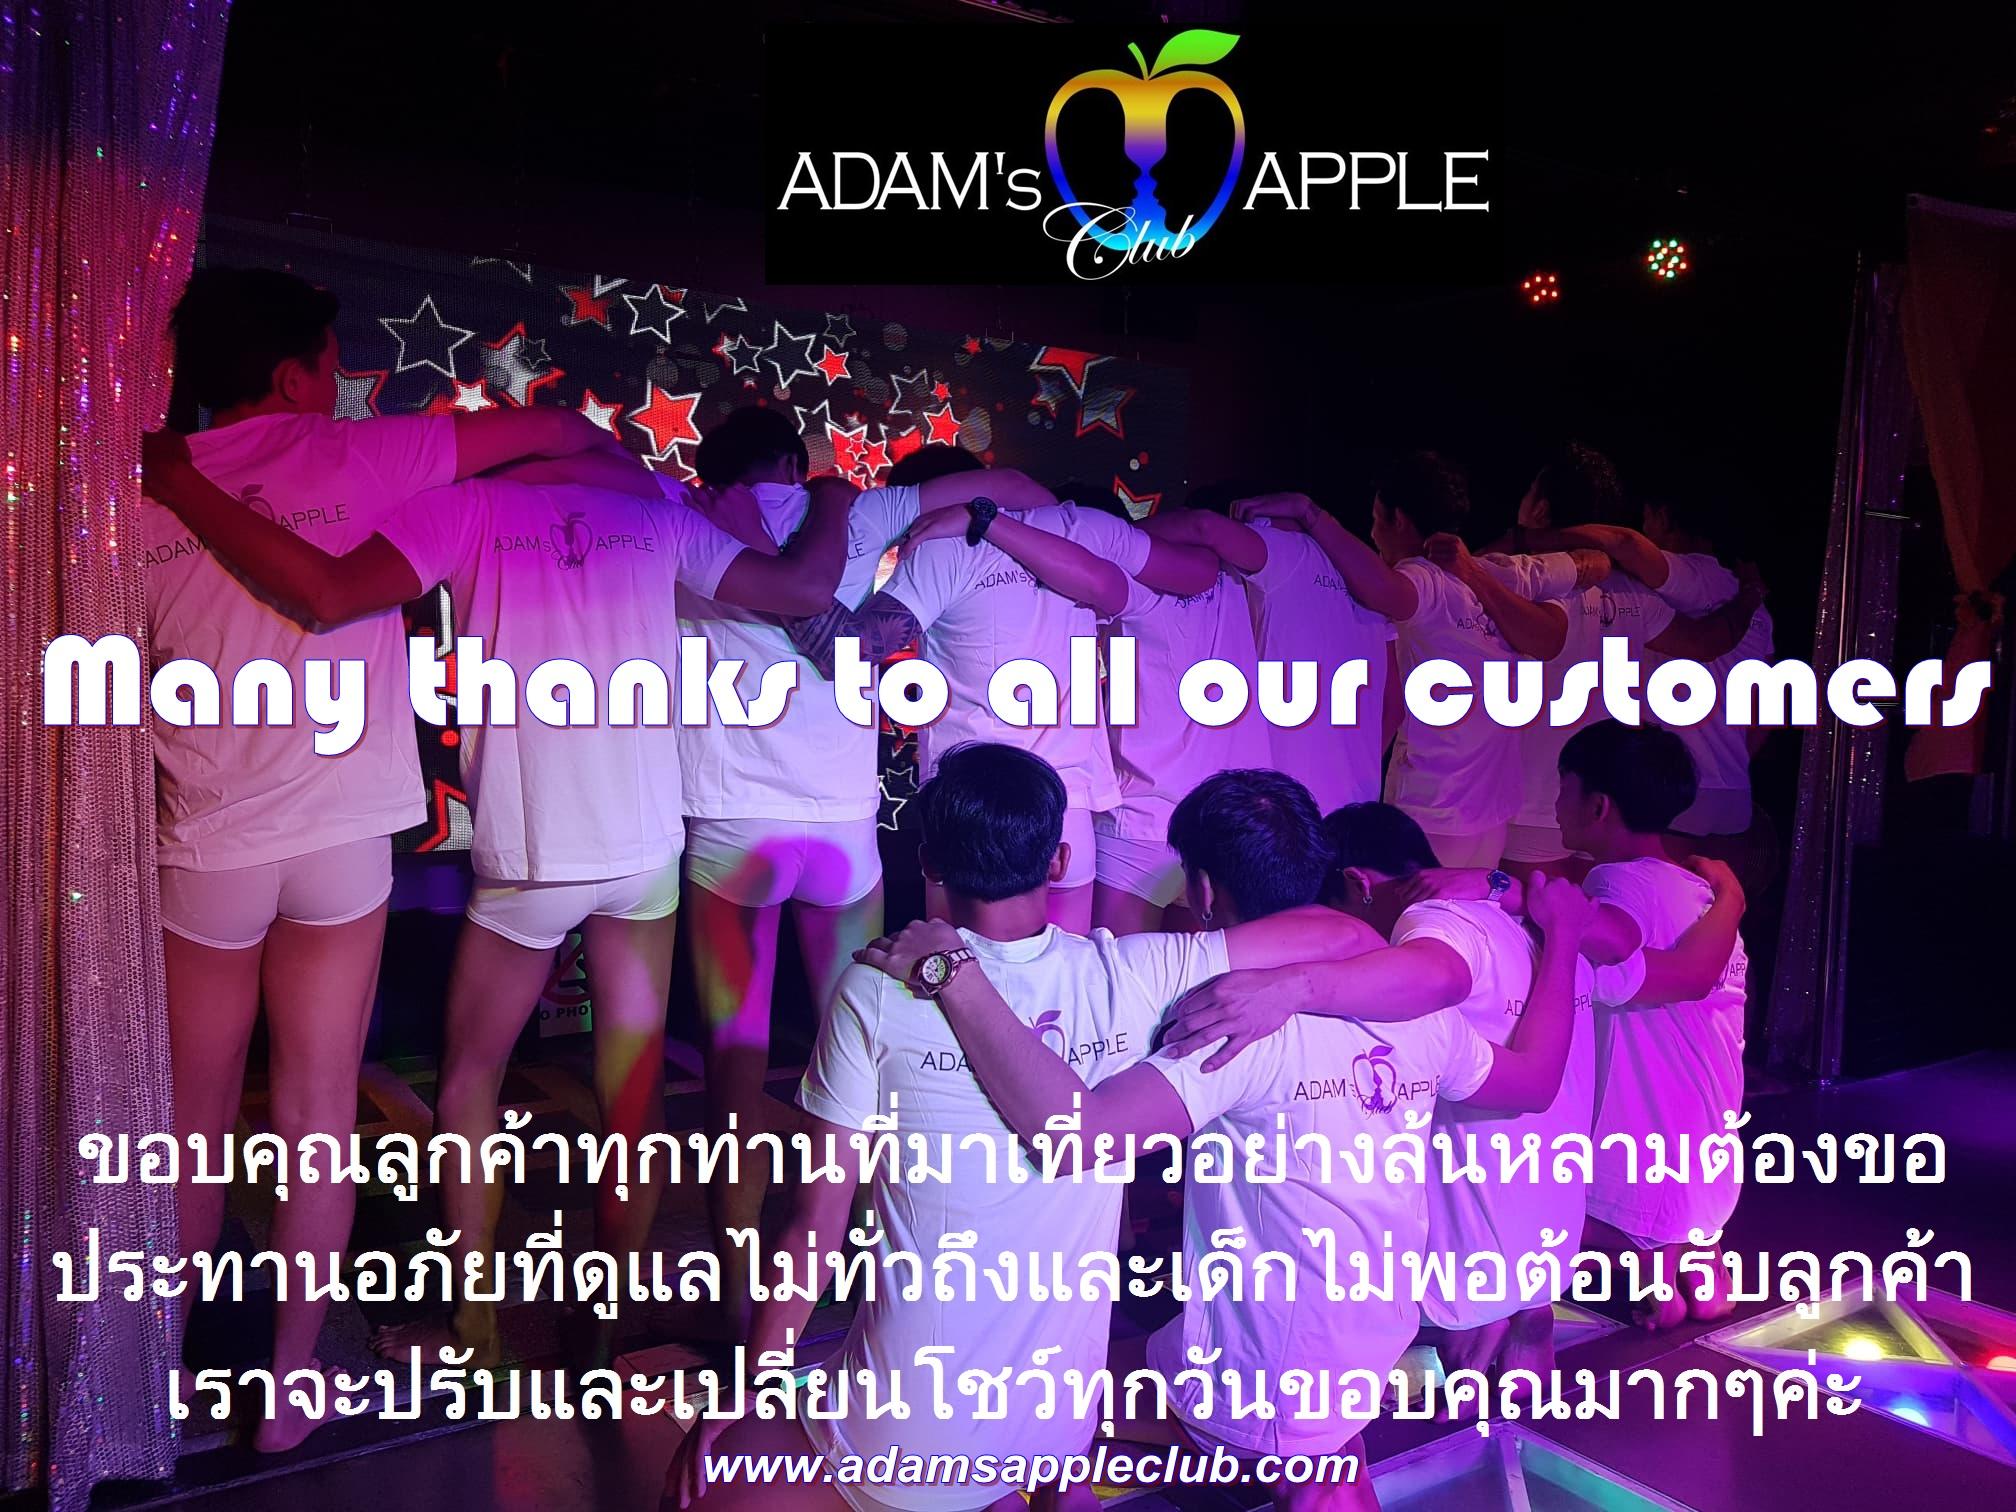 Adams Apple Club Chiang Mai Thank YOU